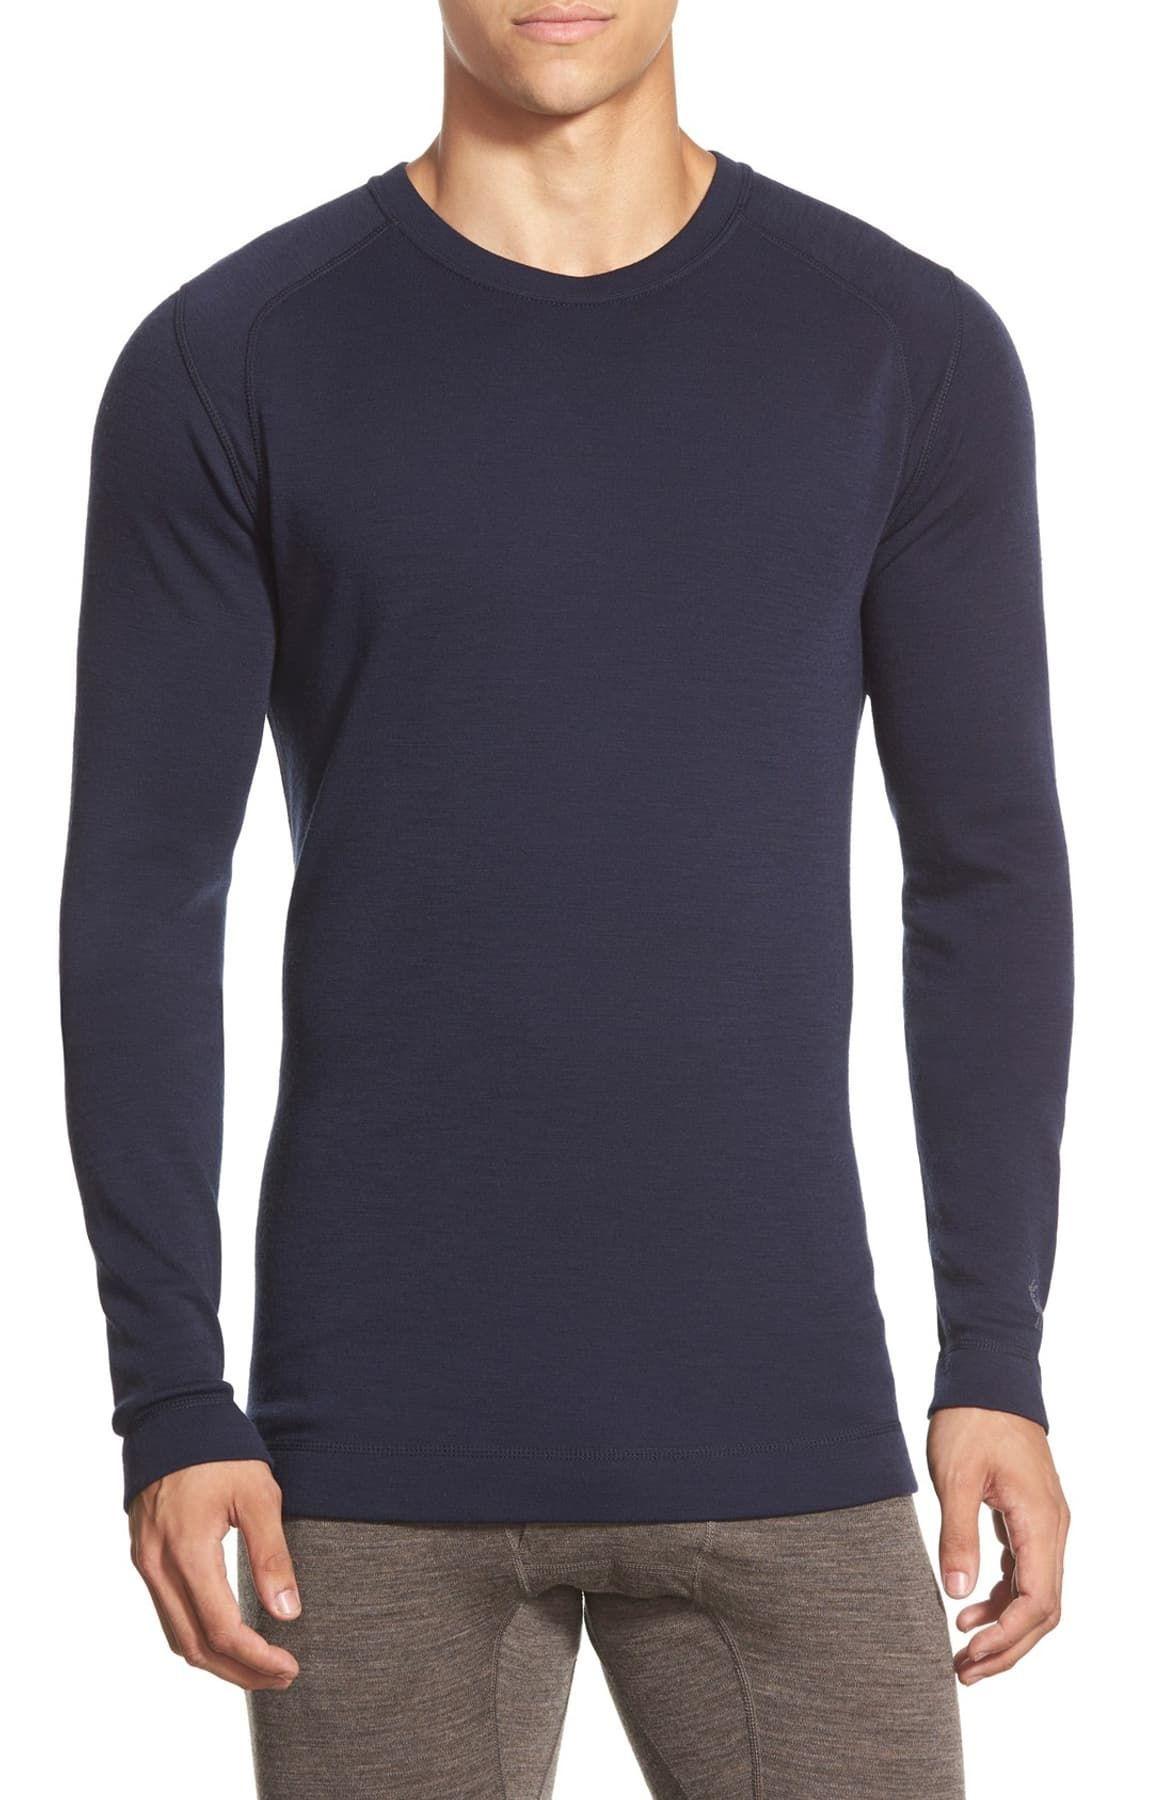 smartwool long sleeve thermal t shirt